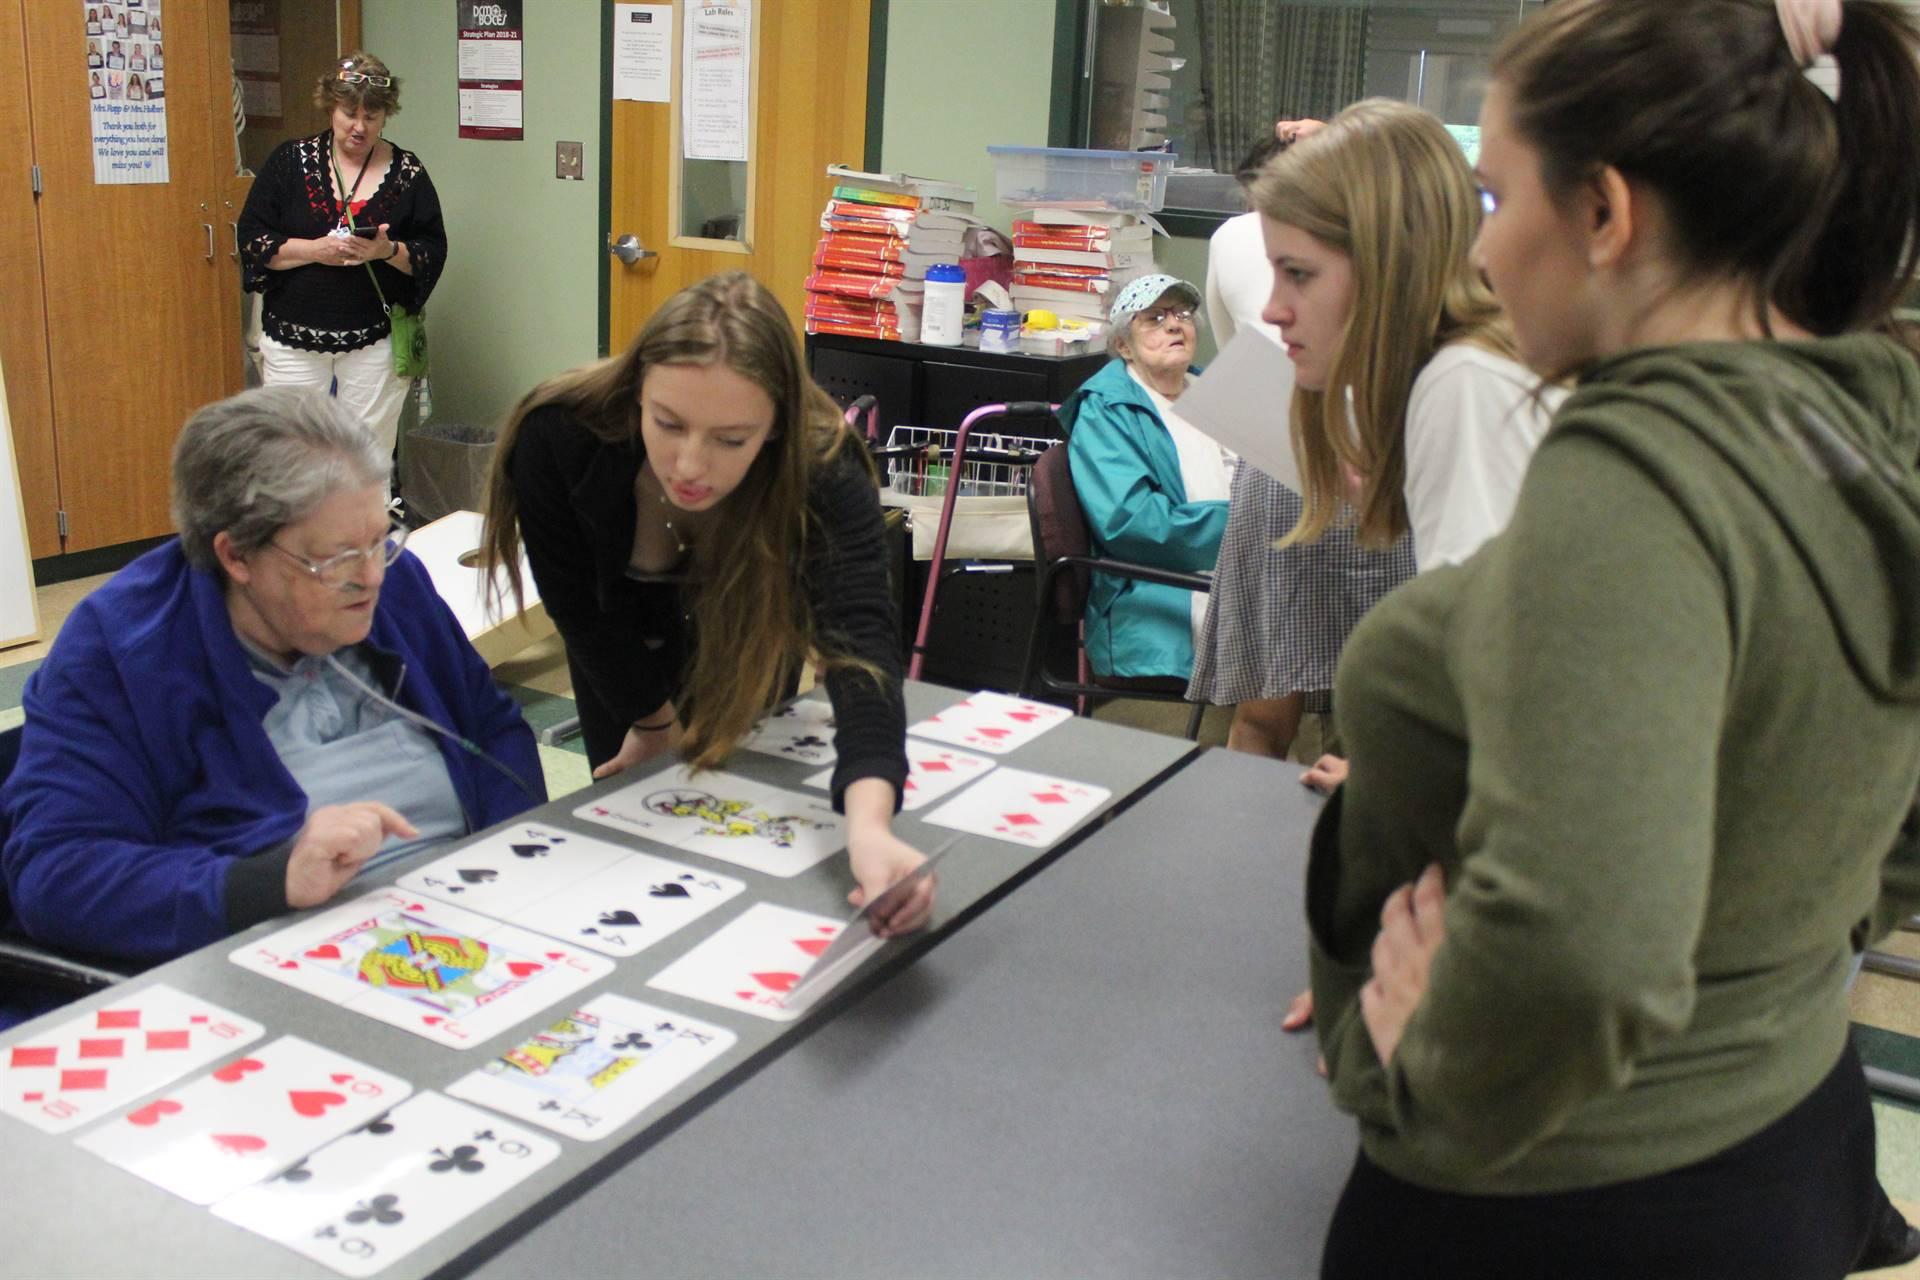 students assisting patient at rehabsite